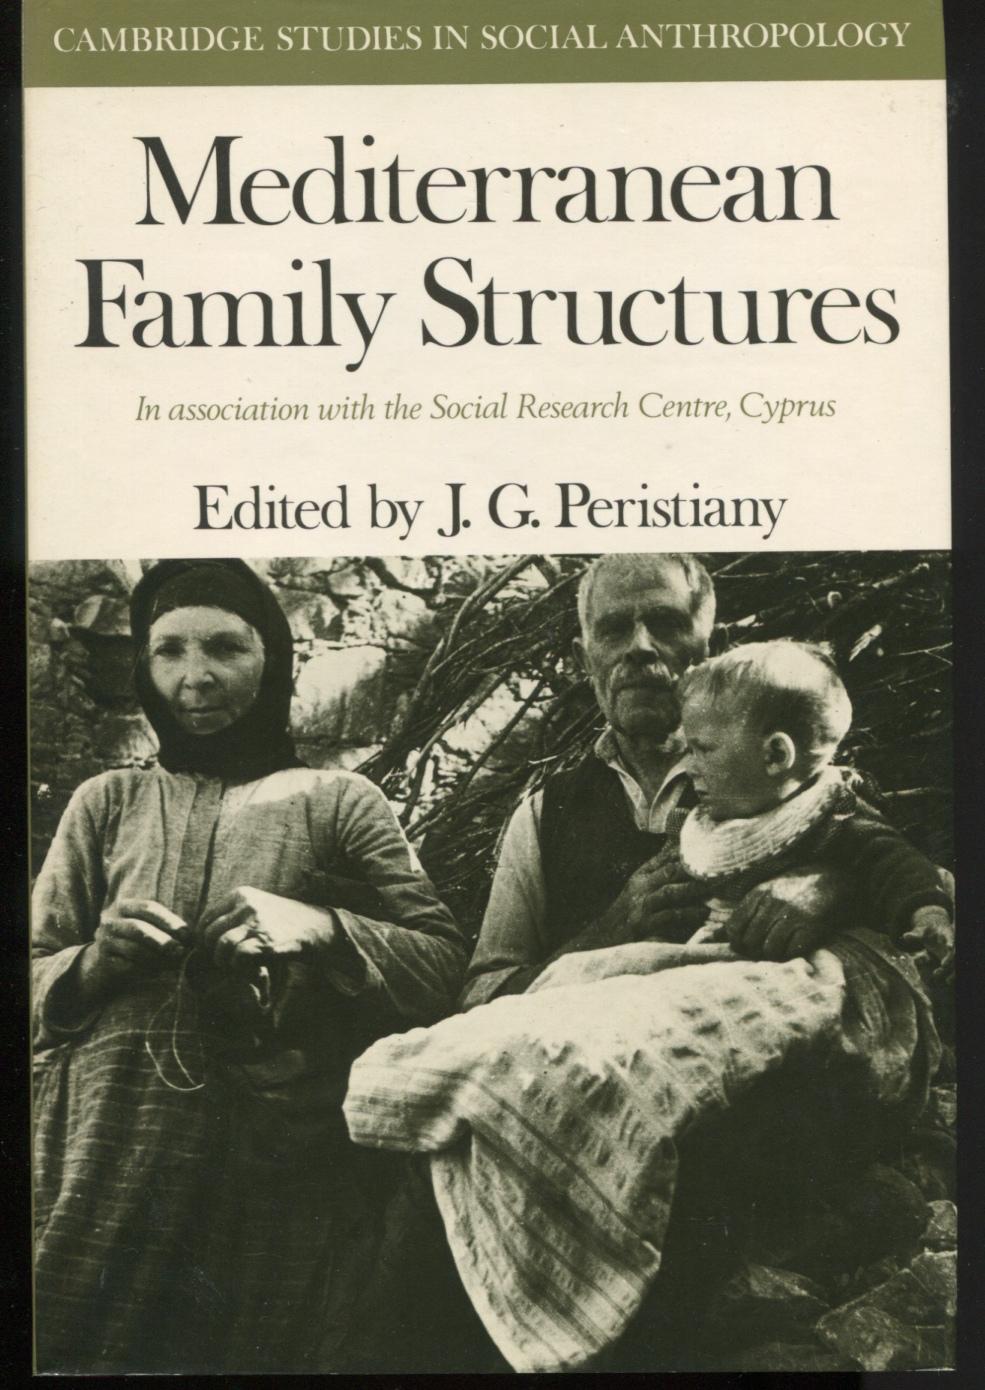 Mediterranean Family Structures.